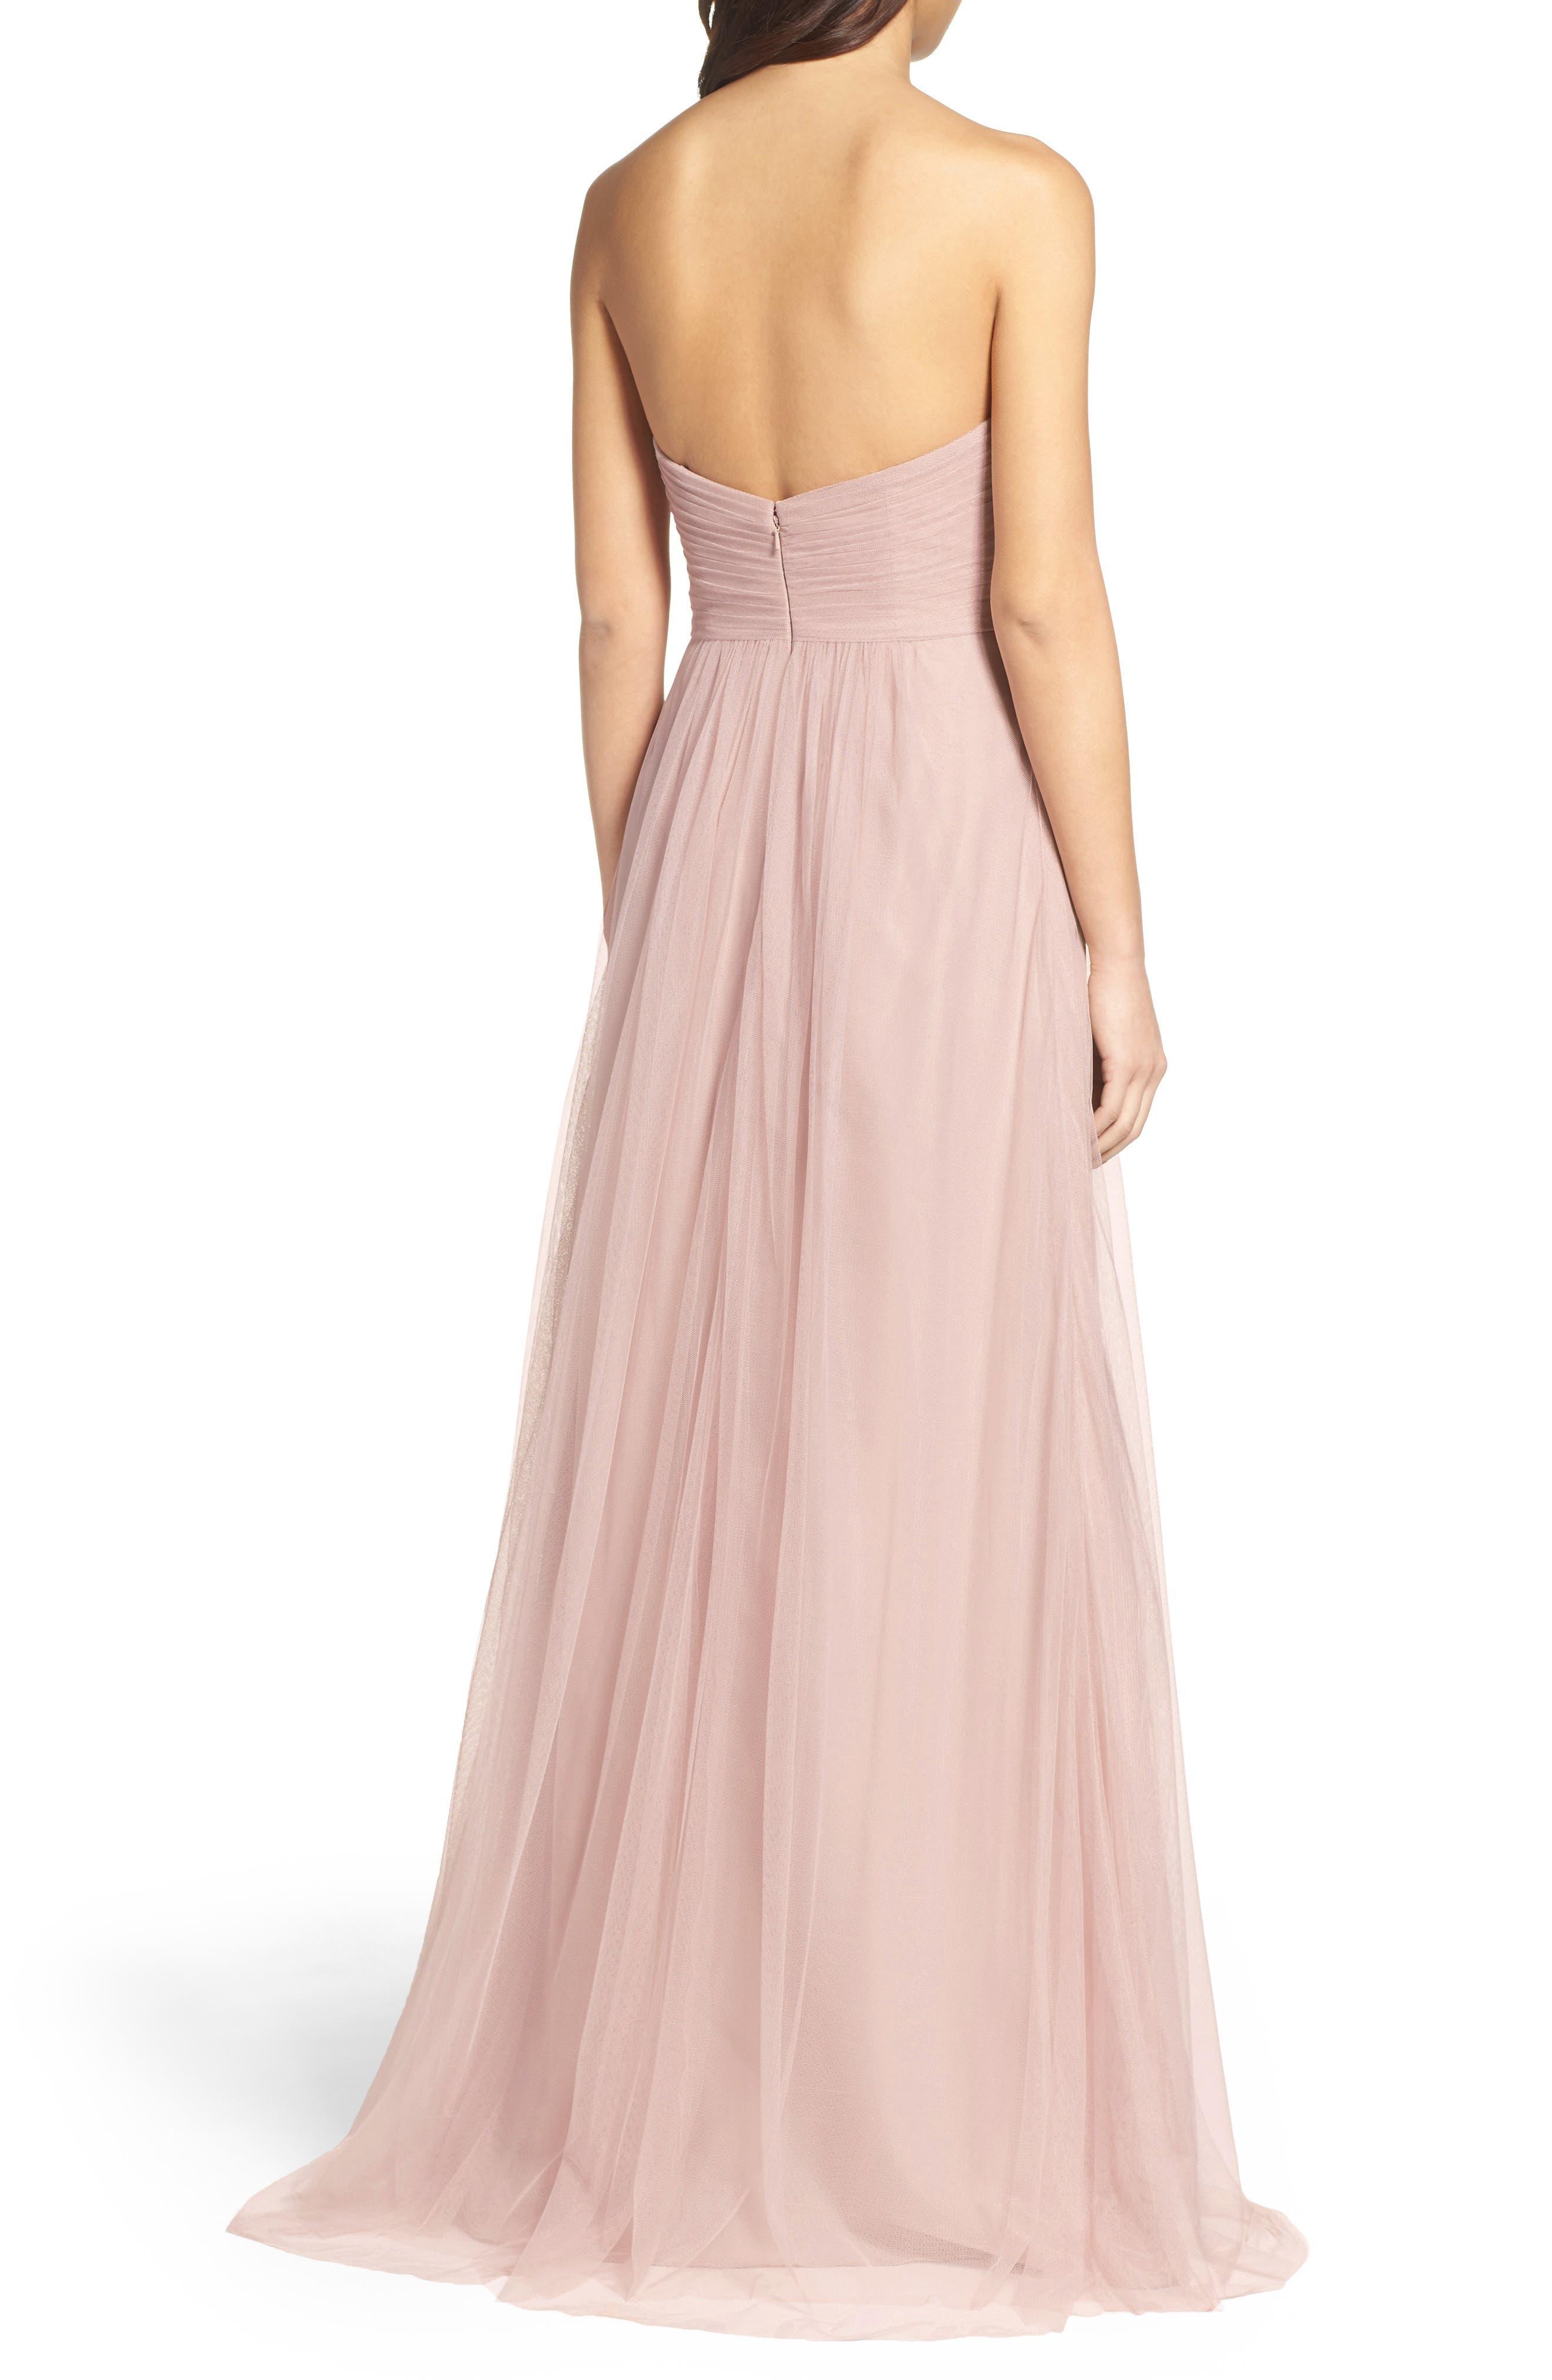 Strapless Tulle Gown,                             Alternate thumbnail 2, color,                             Latte